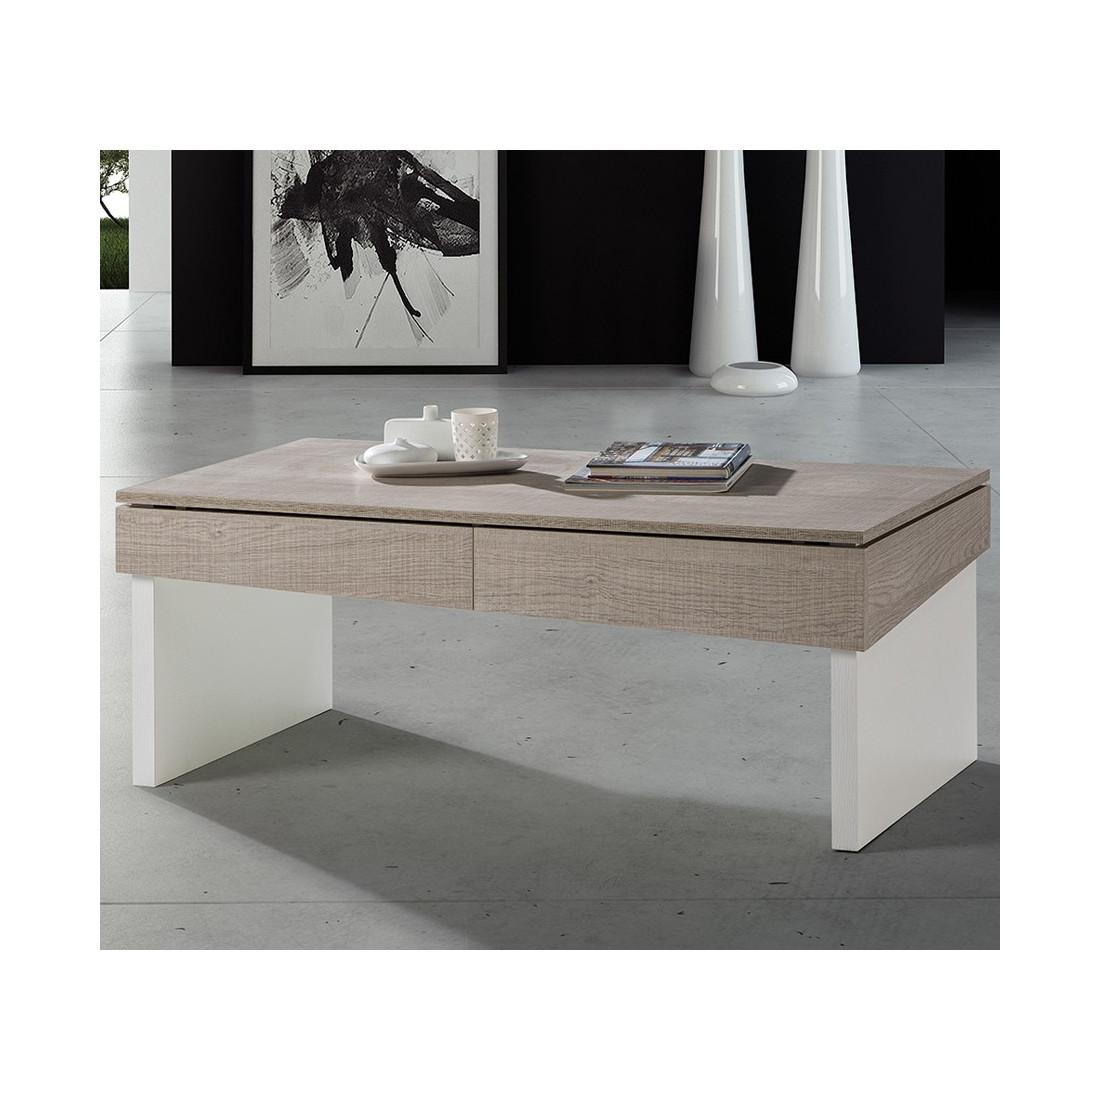 Table Basse Univers Moderne Relevable Salon Chêne Clair Berliose Du Y6gfb7yv